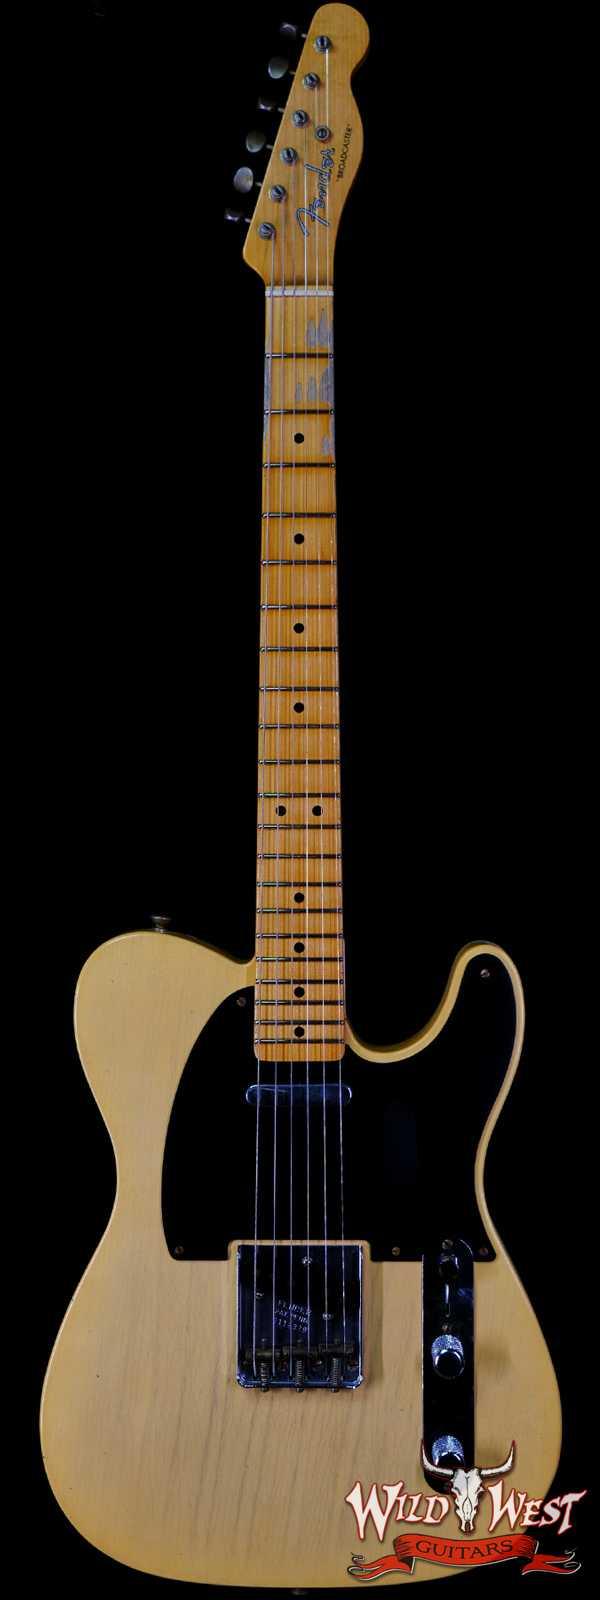 Fender Custom Shop Limited Edition 70th Anniversary Broadcaster (Telecaster) Jorneyman Relic Nocaster Blonde R112329